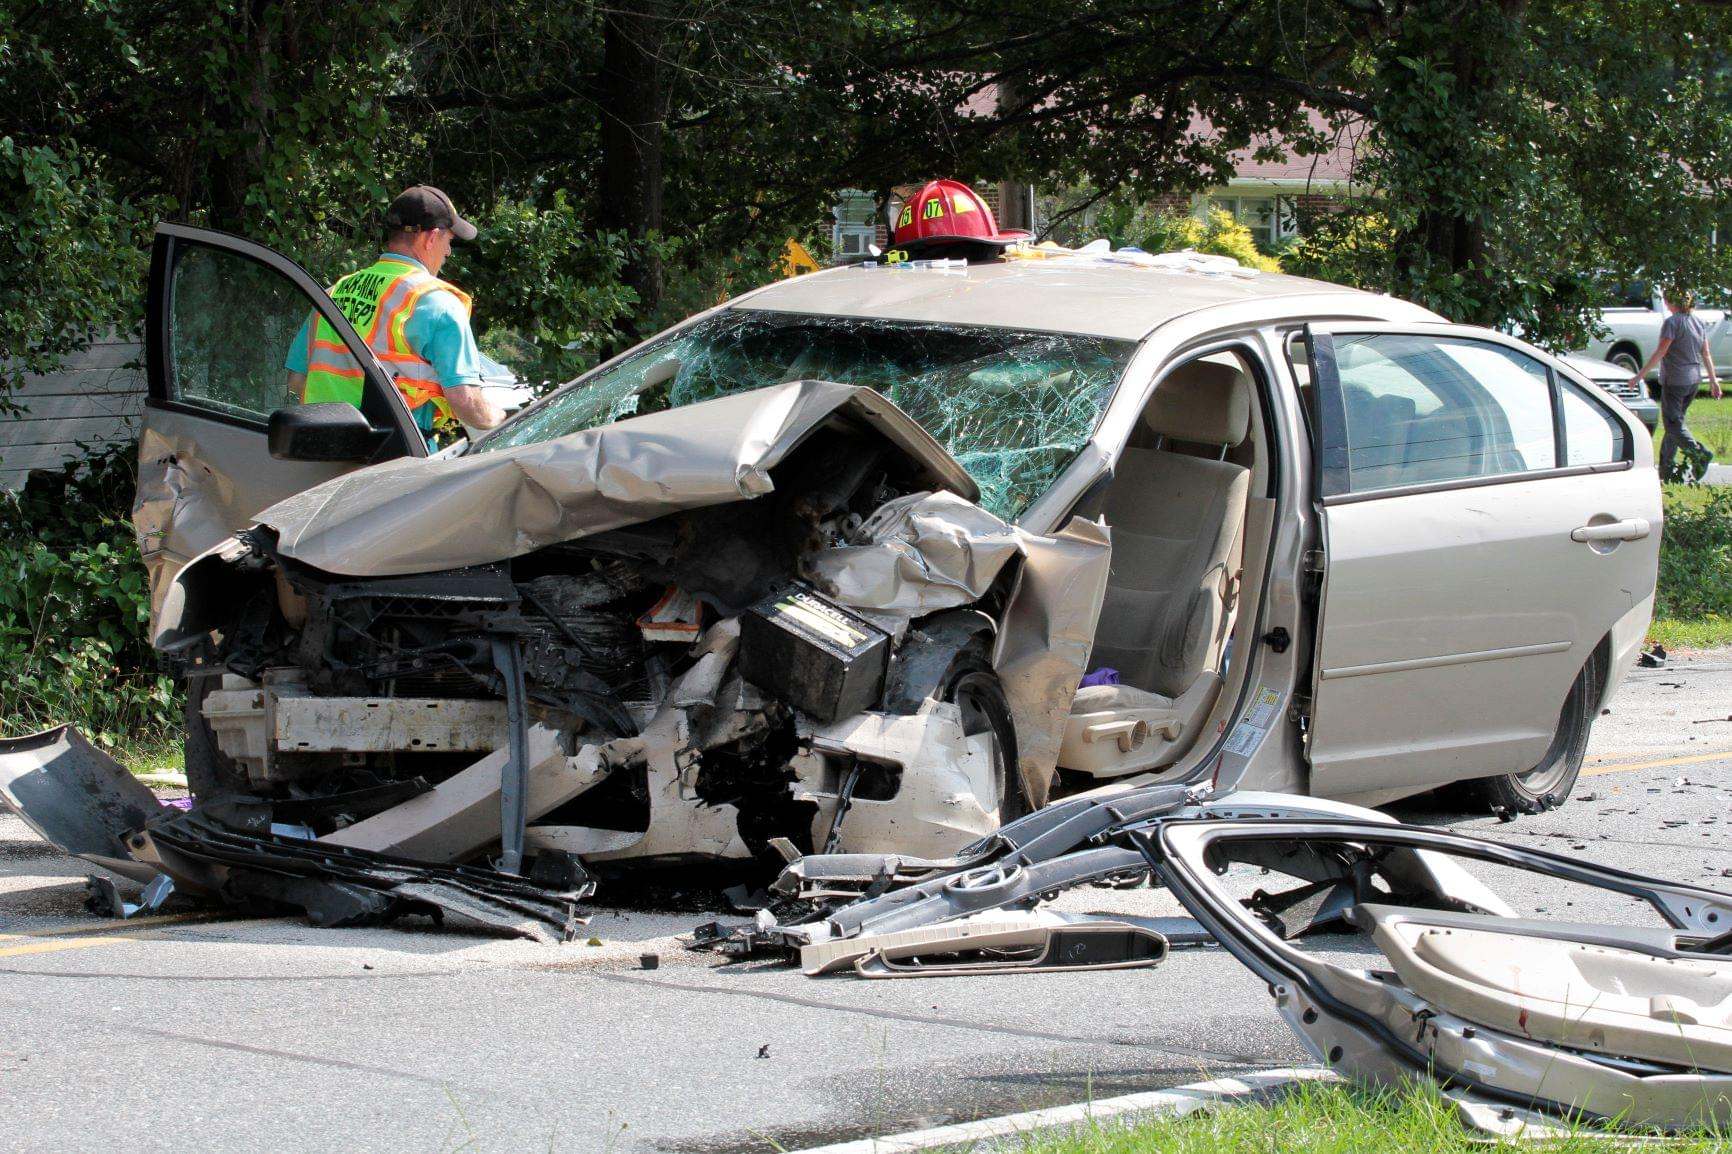 3 Injured In Wayne County Car Crash (PHOTO GALLERY)